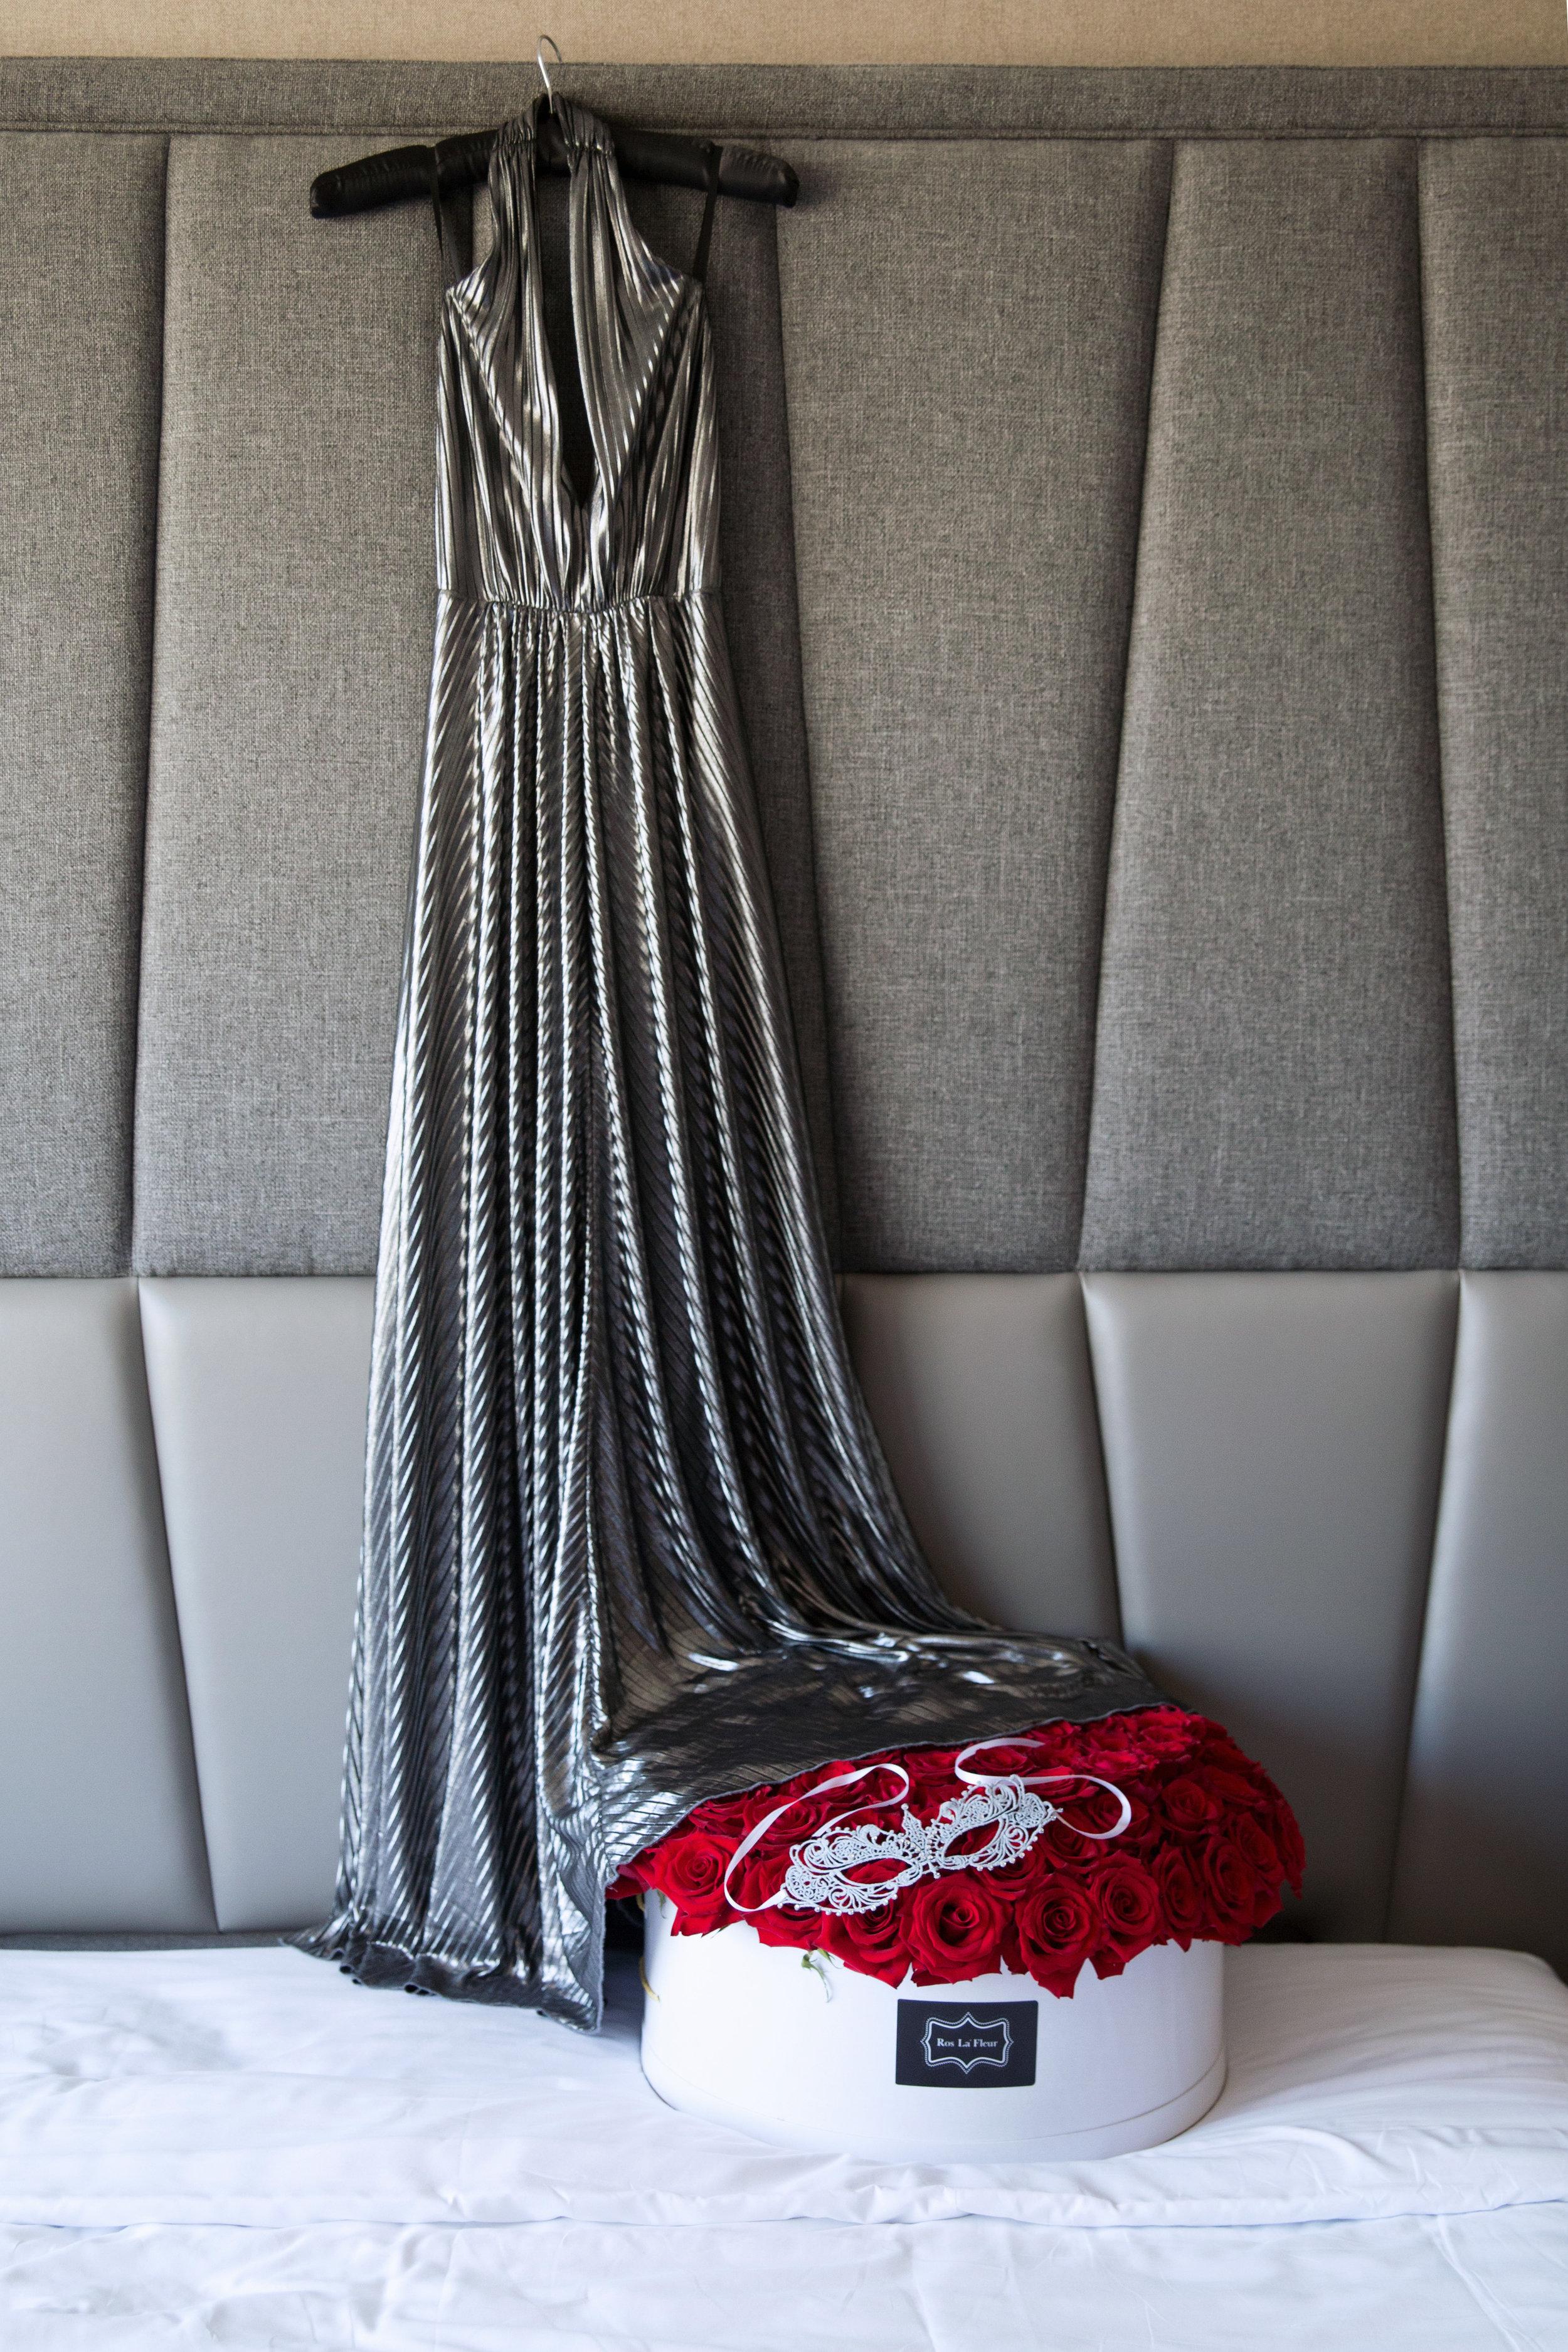 silver dress hanging.jpg